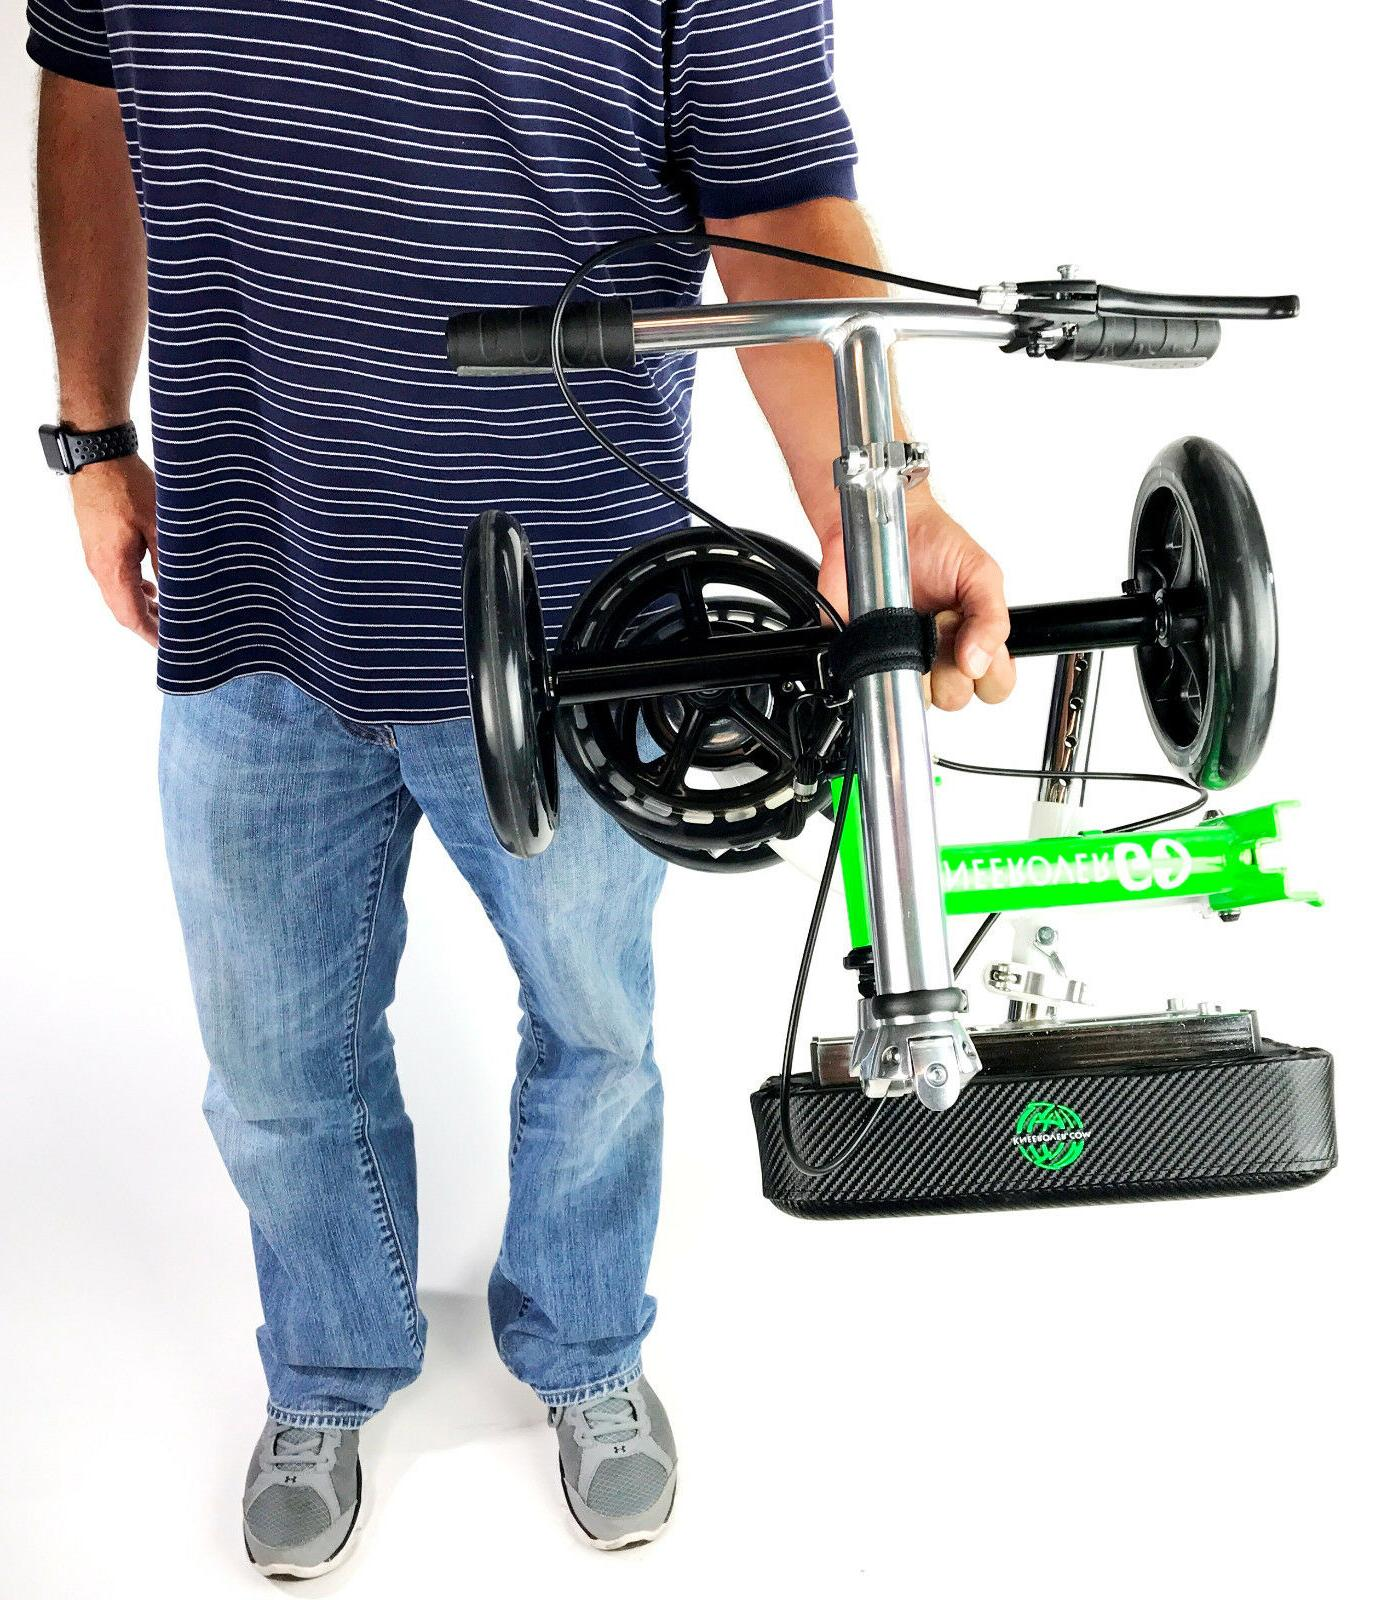 NEW GO Walker - Compact & Knee Scooter